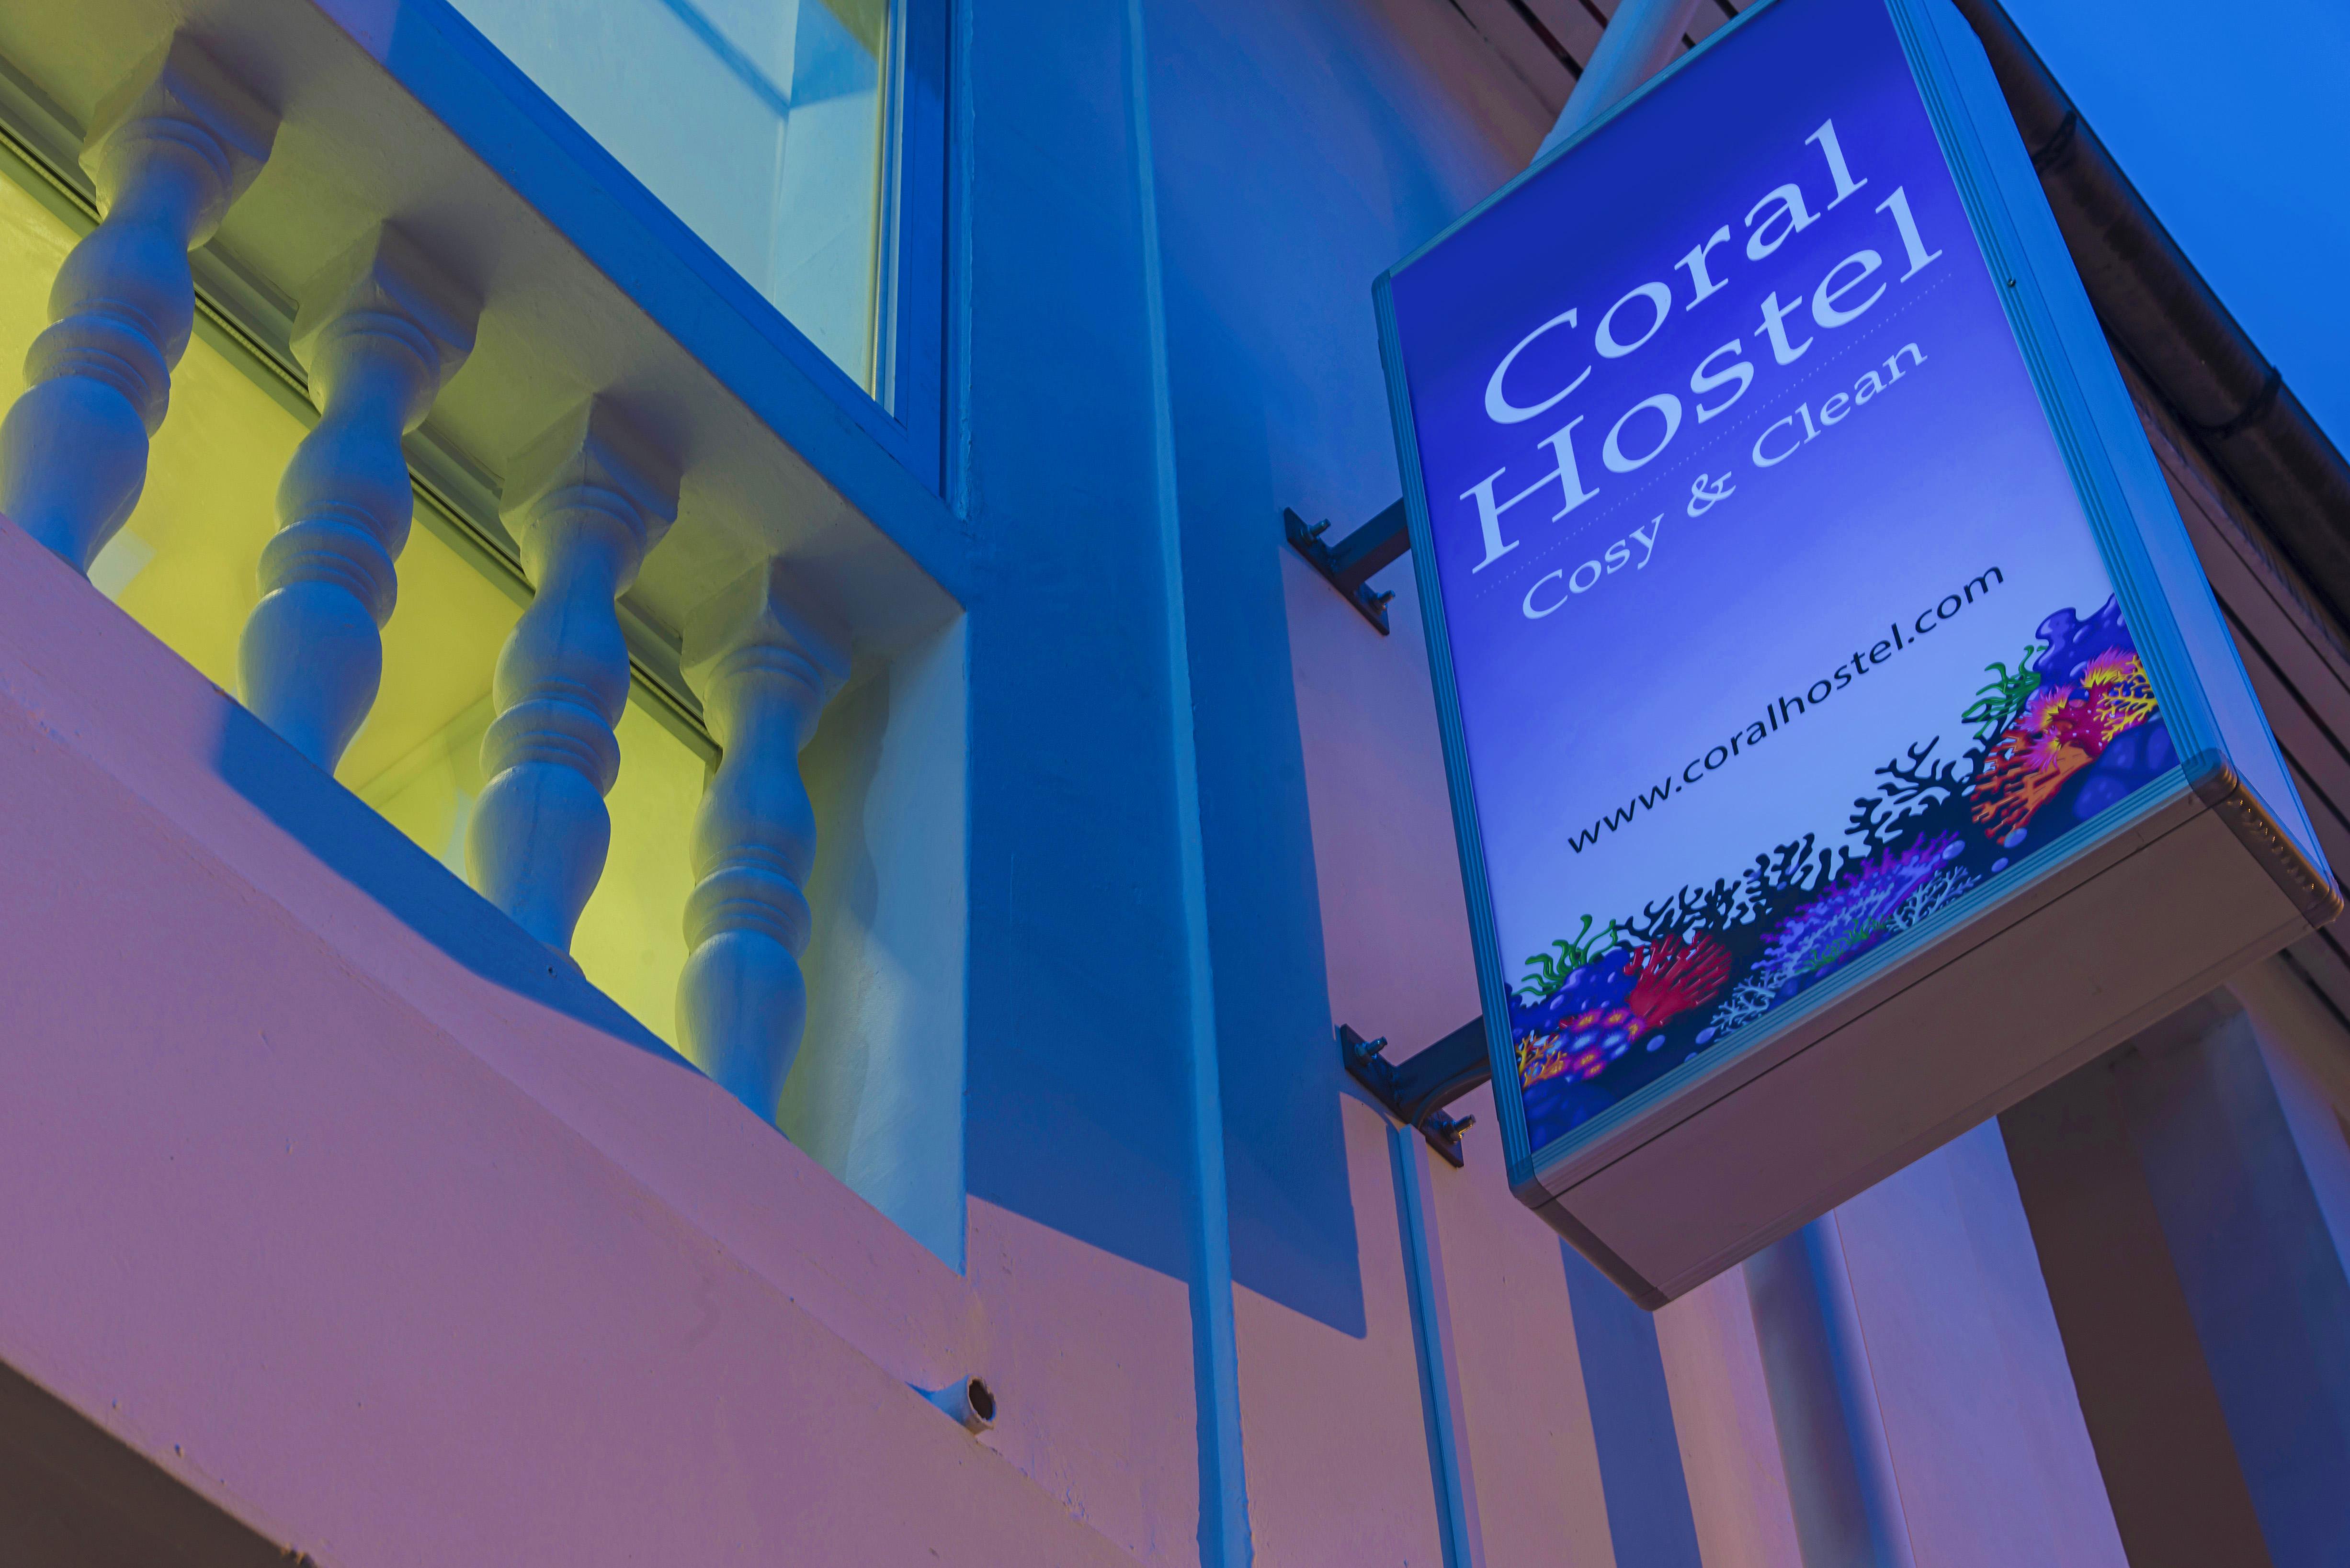 Coral Hostel